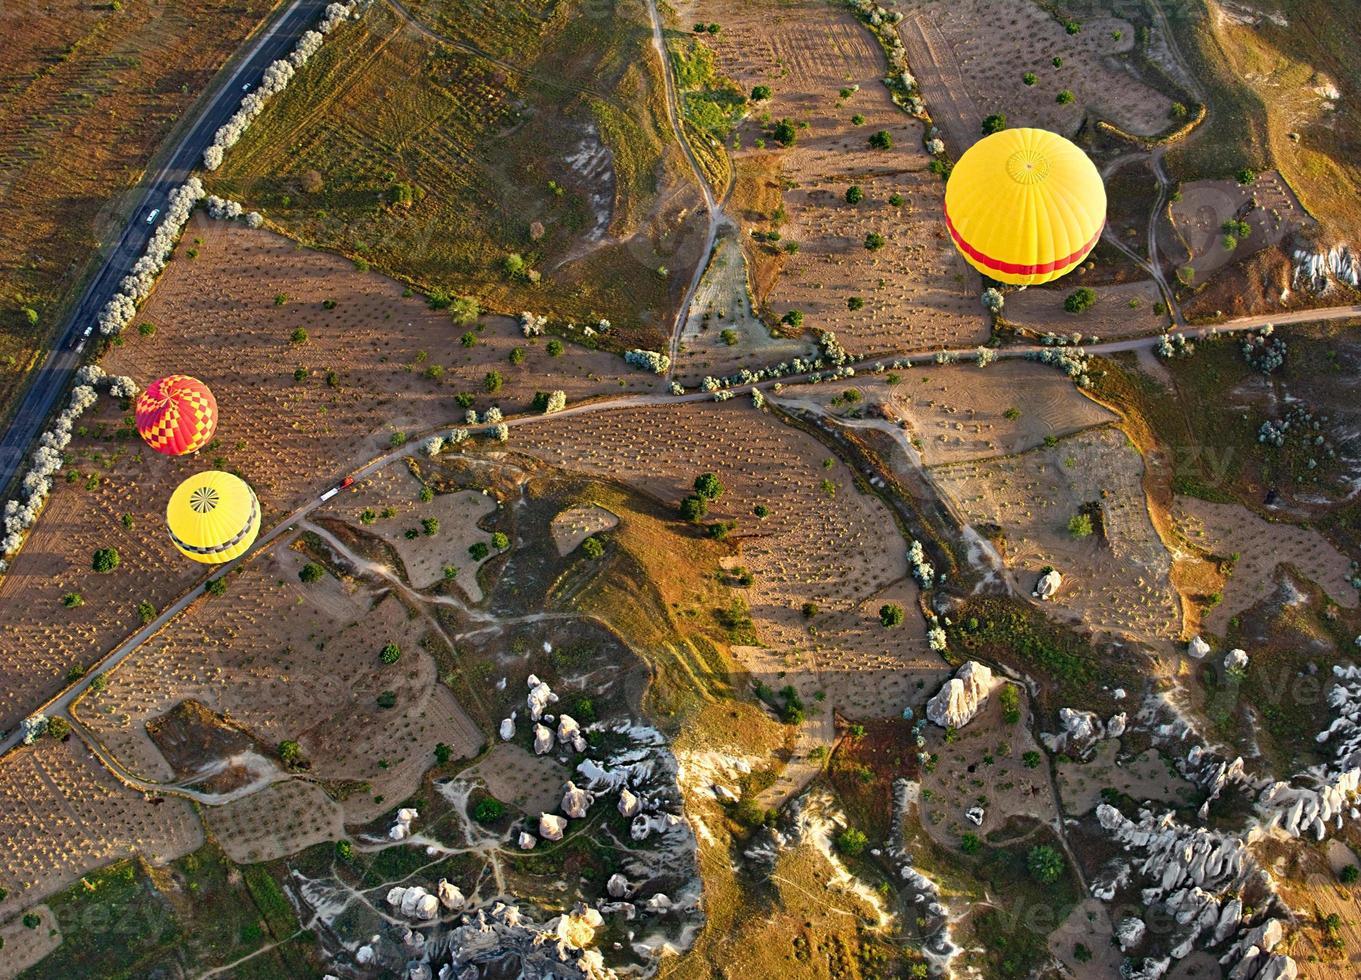 Balloon flight over ancient rocks, Cappadocia, Turkey. photo